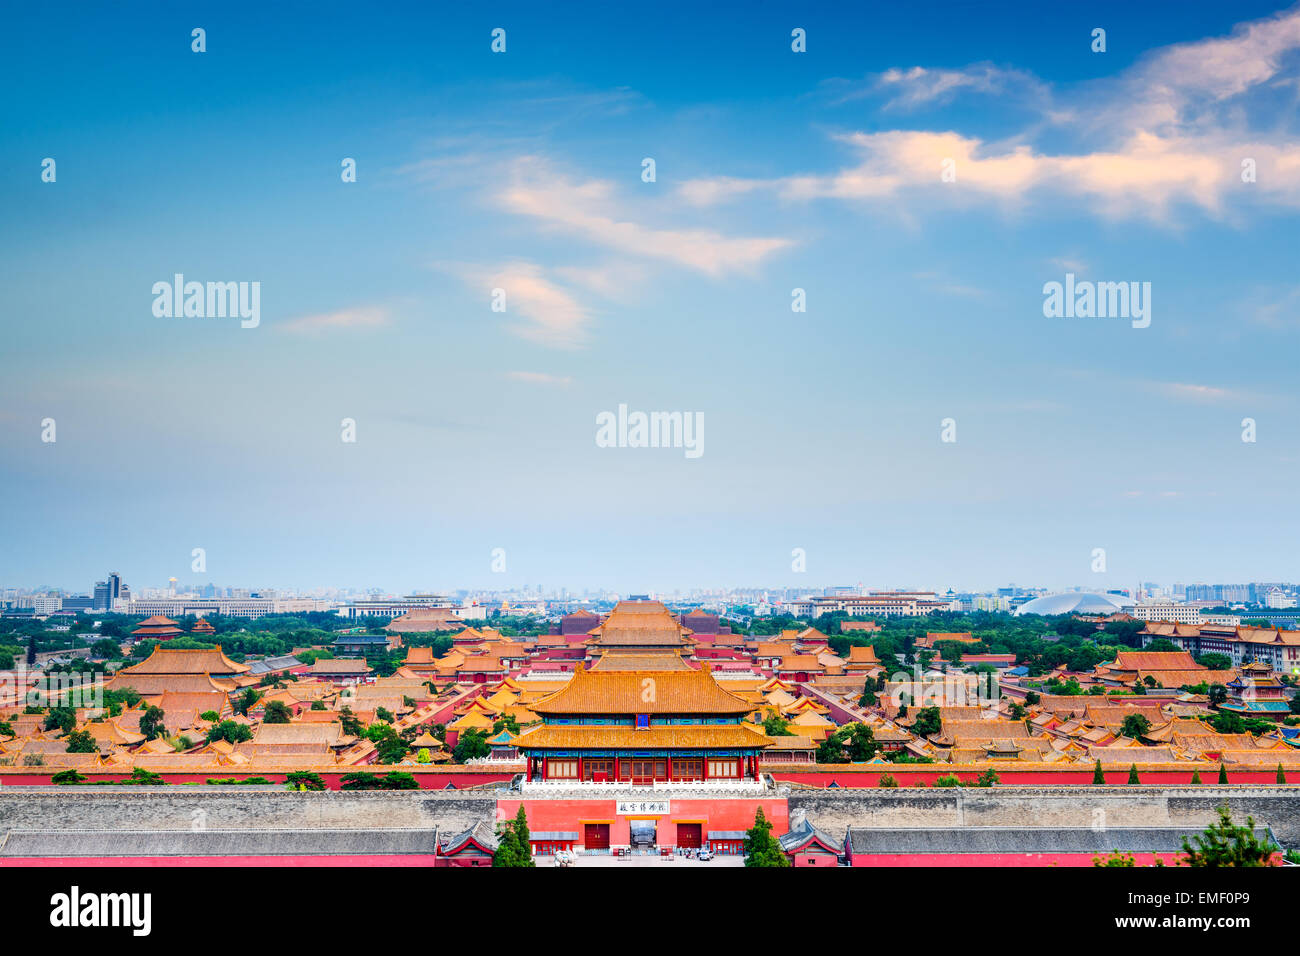 Beijing, China overlooking the Forbidden City. Stock Photo